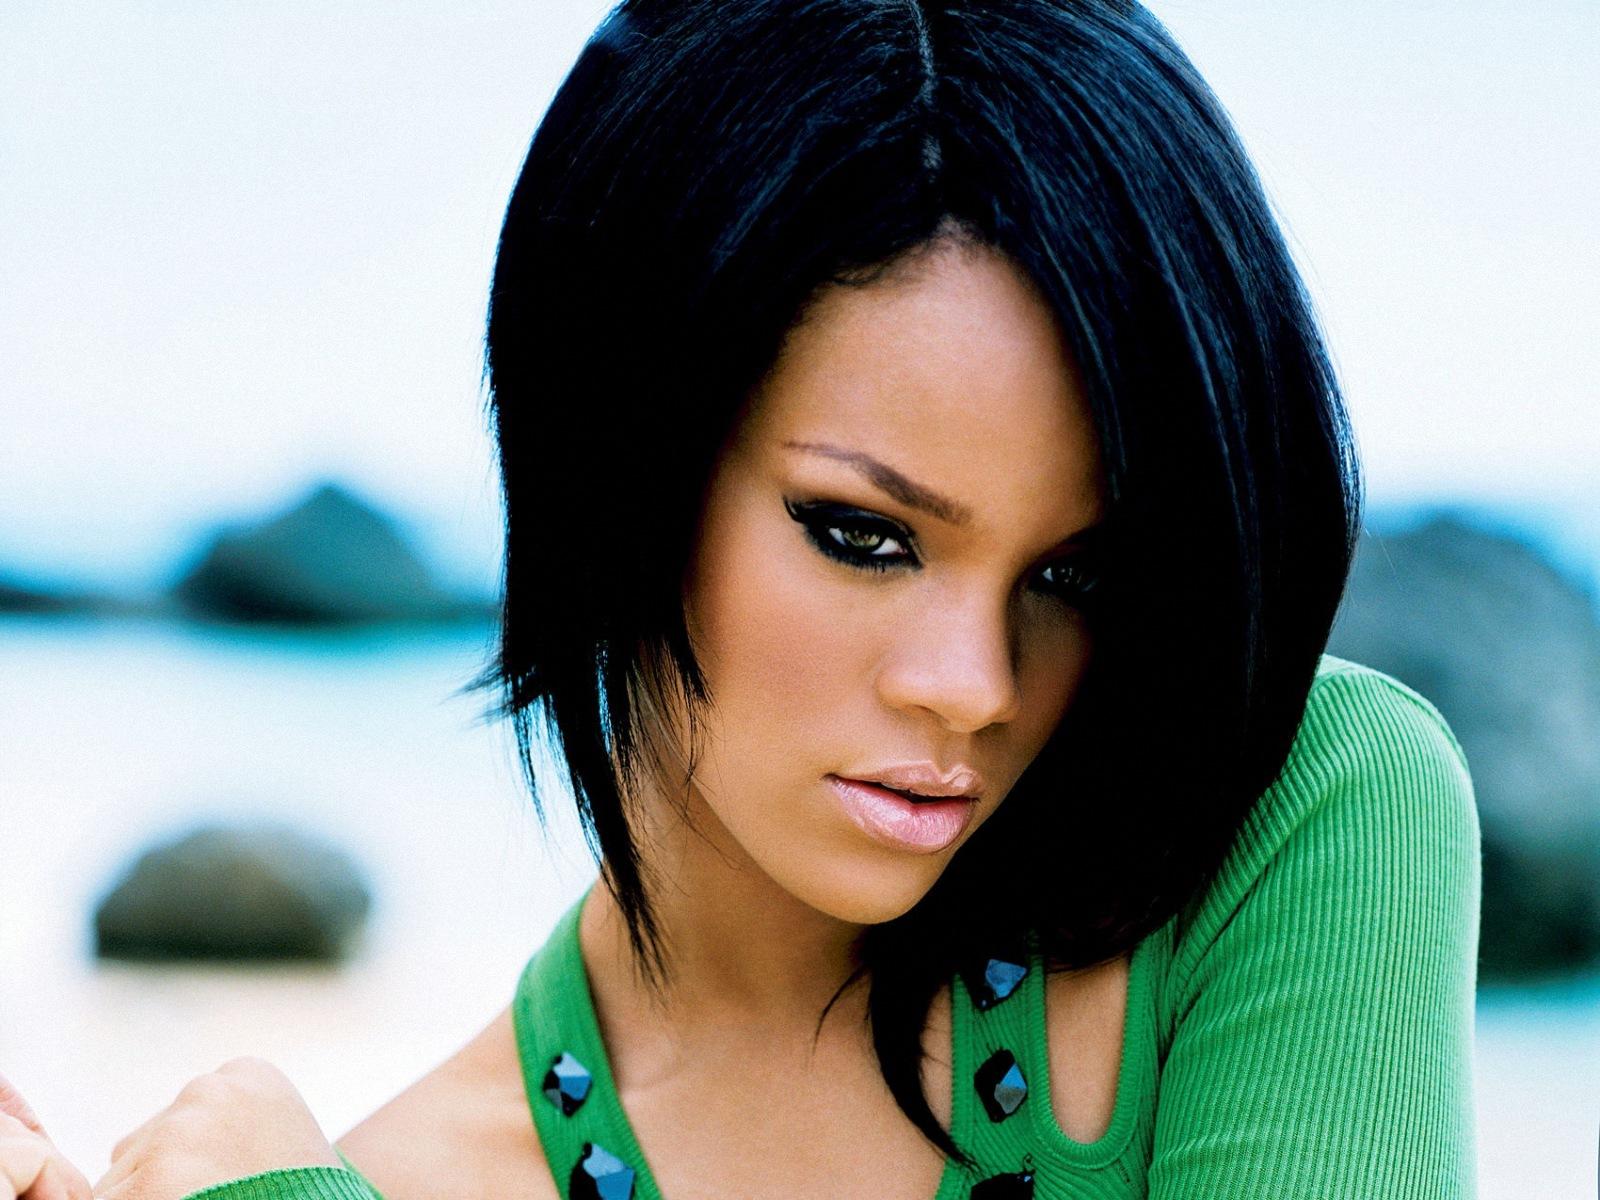 http://2.bp.blogspot.com/-8W7lbBxndvk/T7tXgpfek_I/AAAAAAAAAeA/fRJ_jiiYJps/s1600/ws_Rihanna_Green_Blouse_1600x1200.jpg